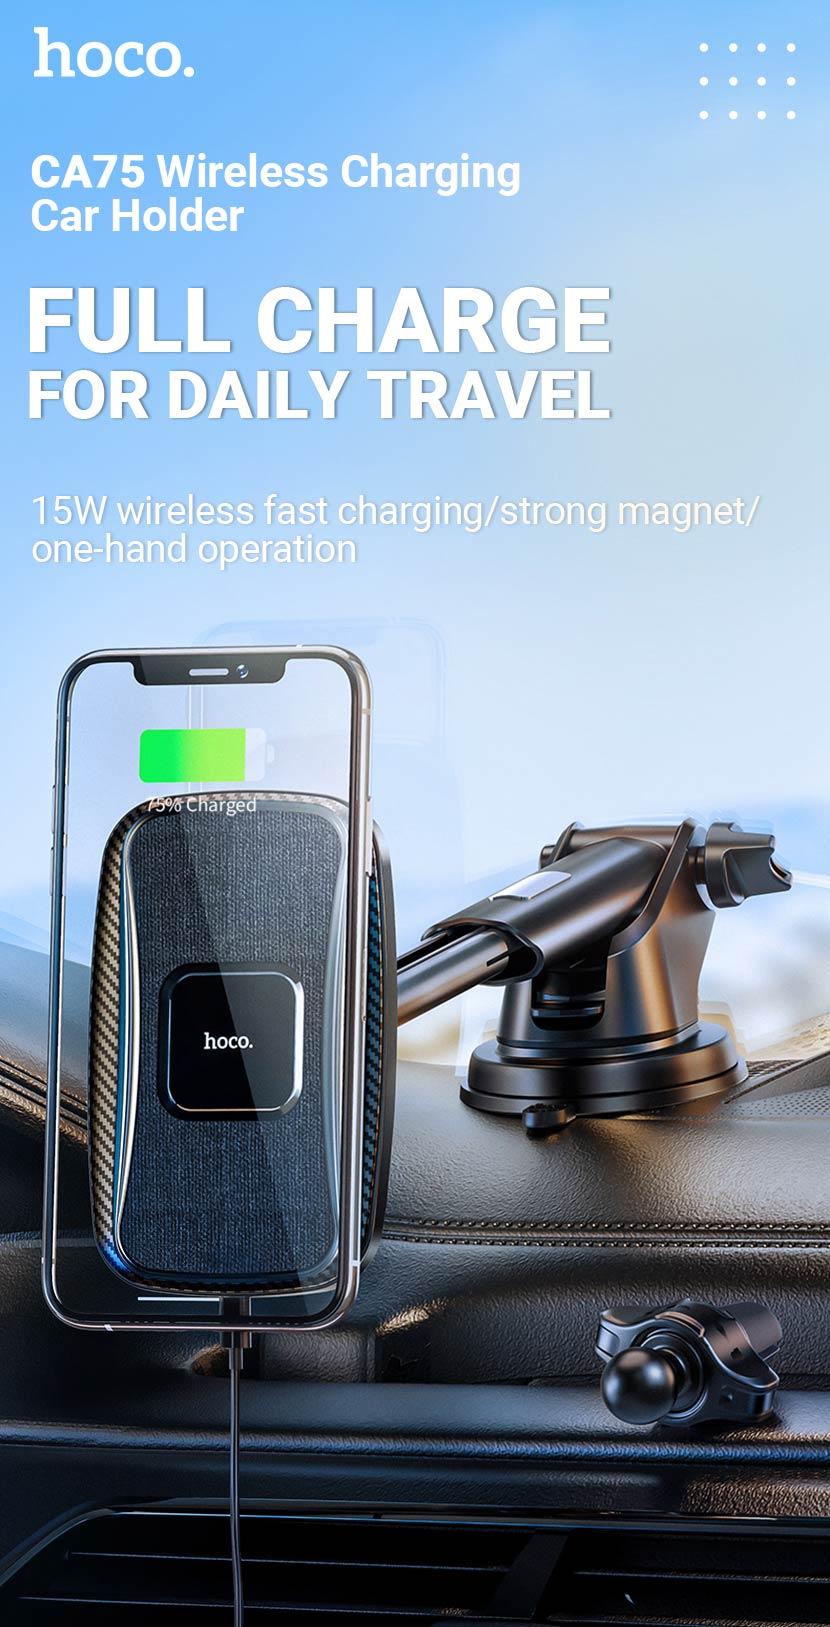 hoco news ca75 magnetic wireless charging car holder en